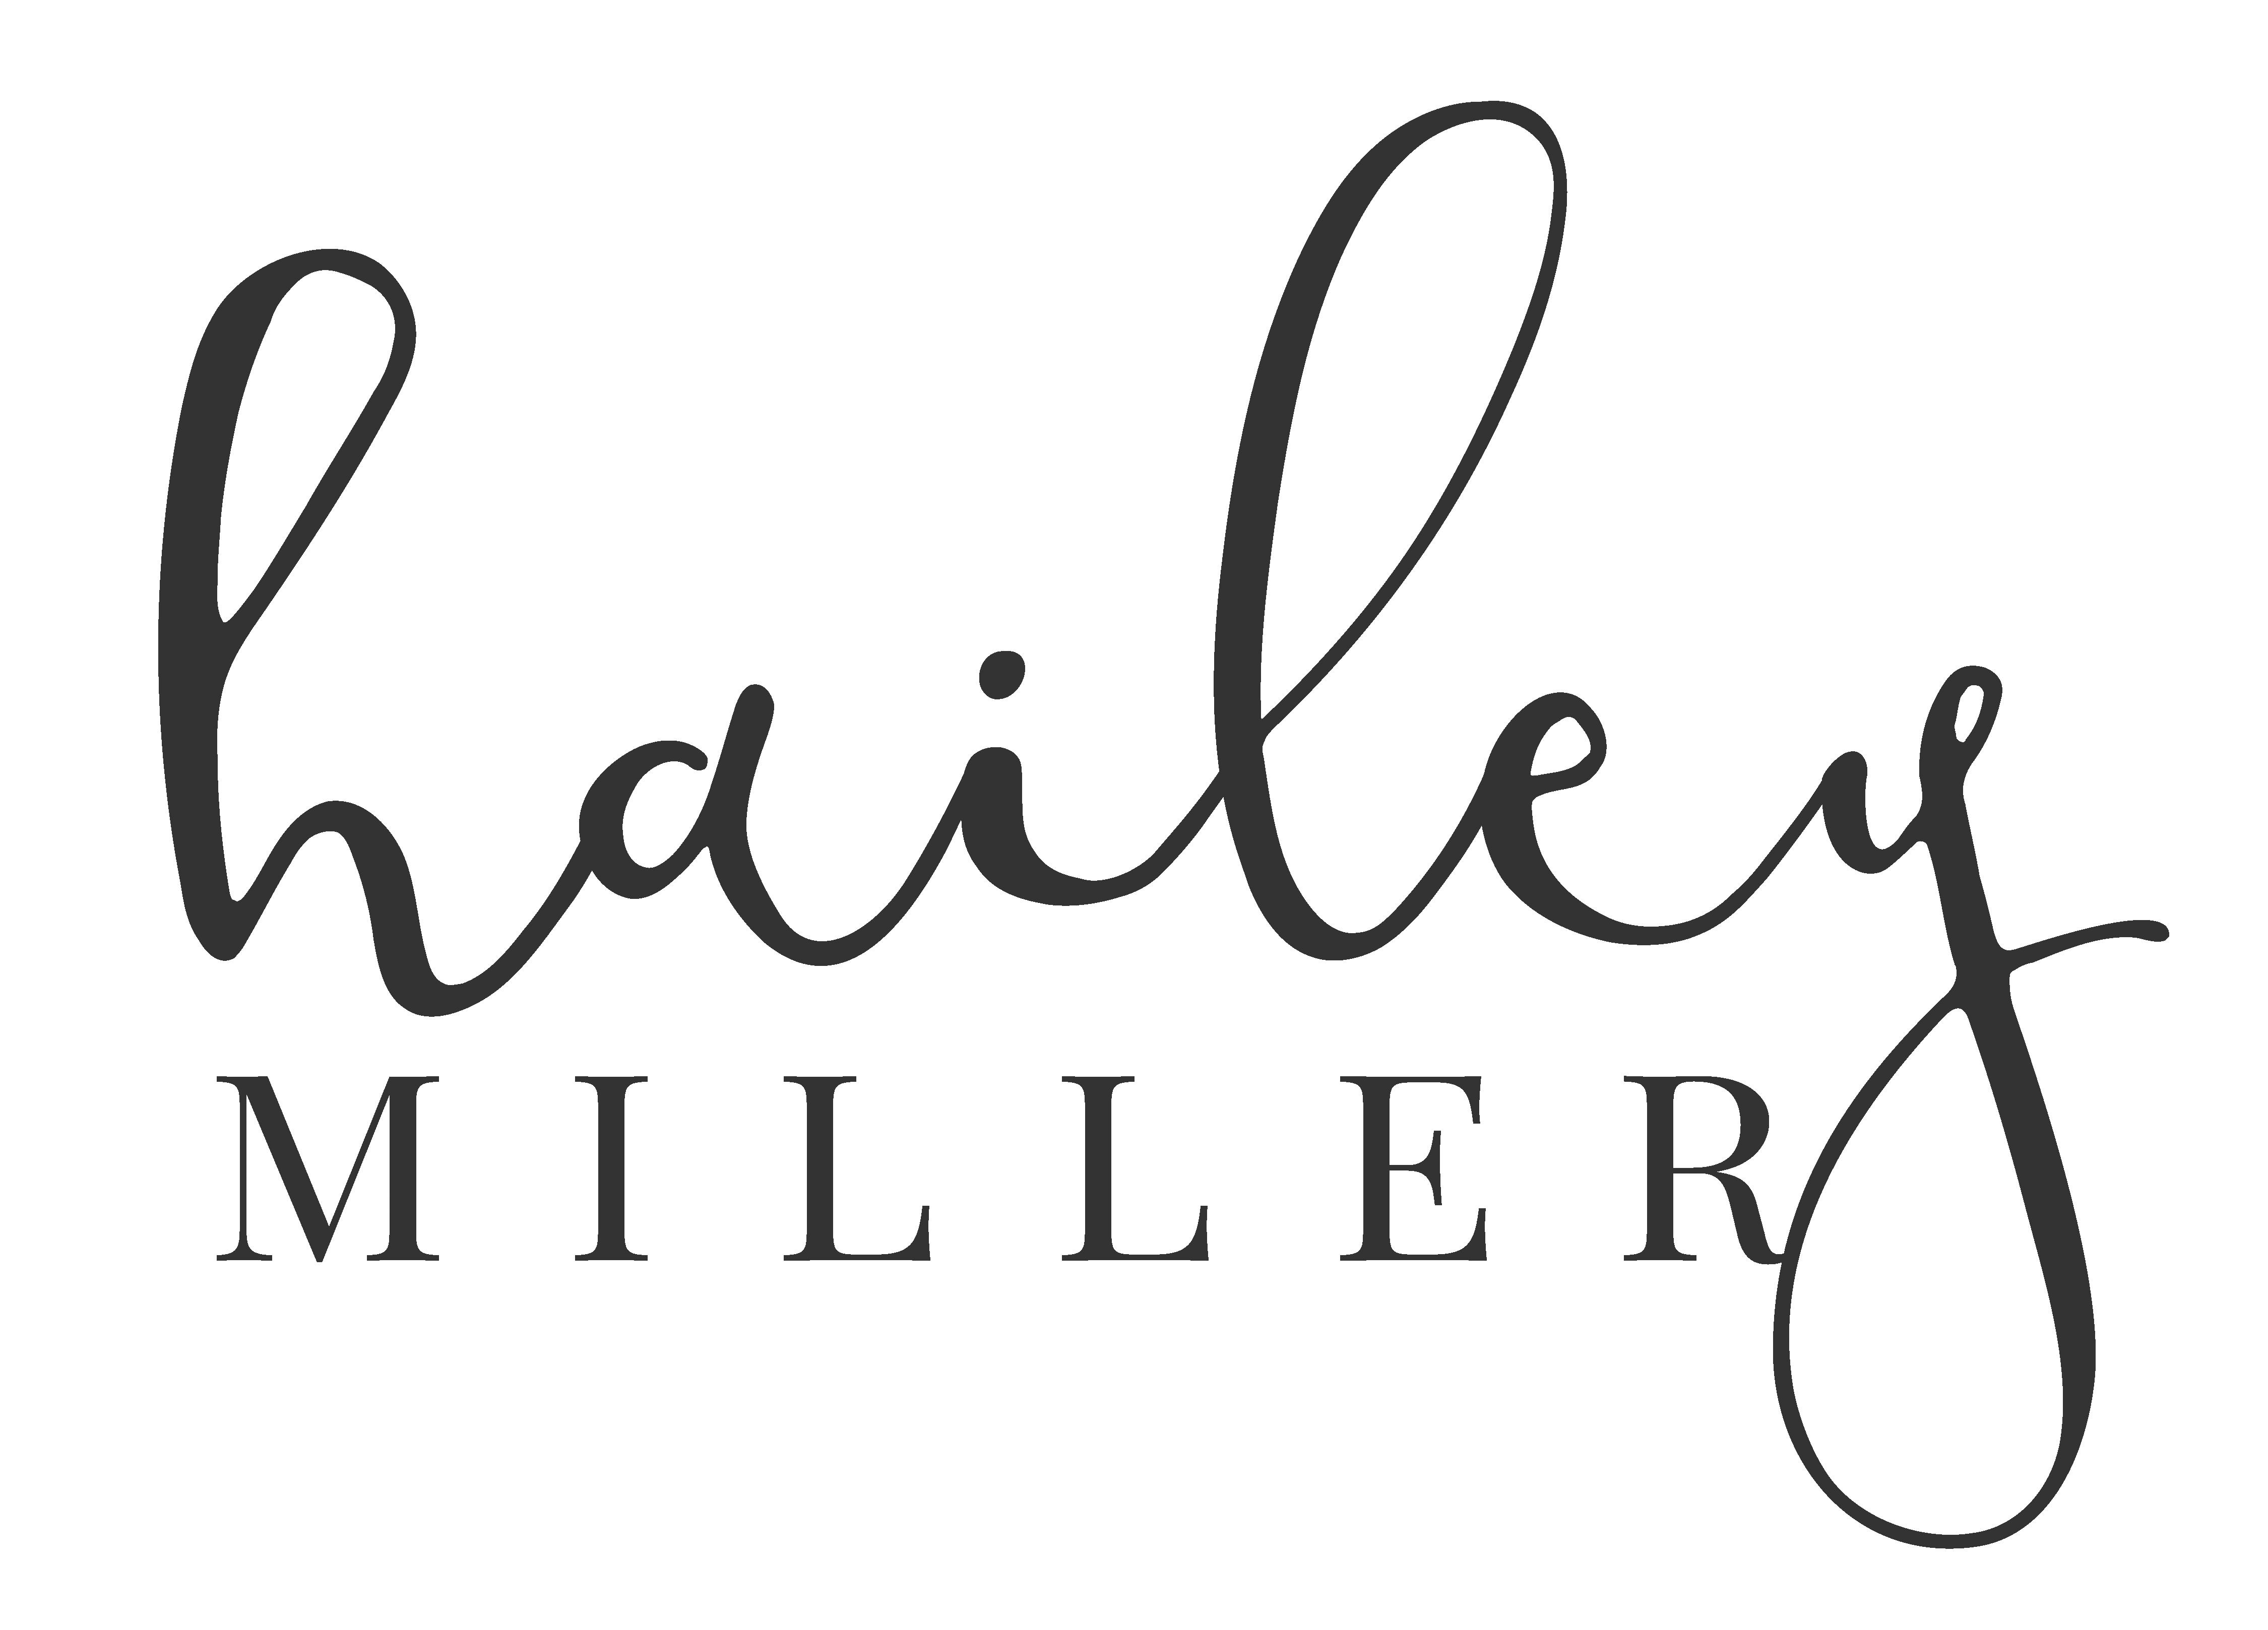 Hailey Miller